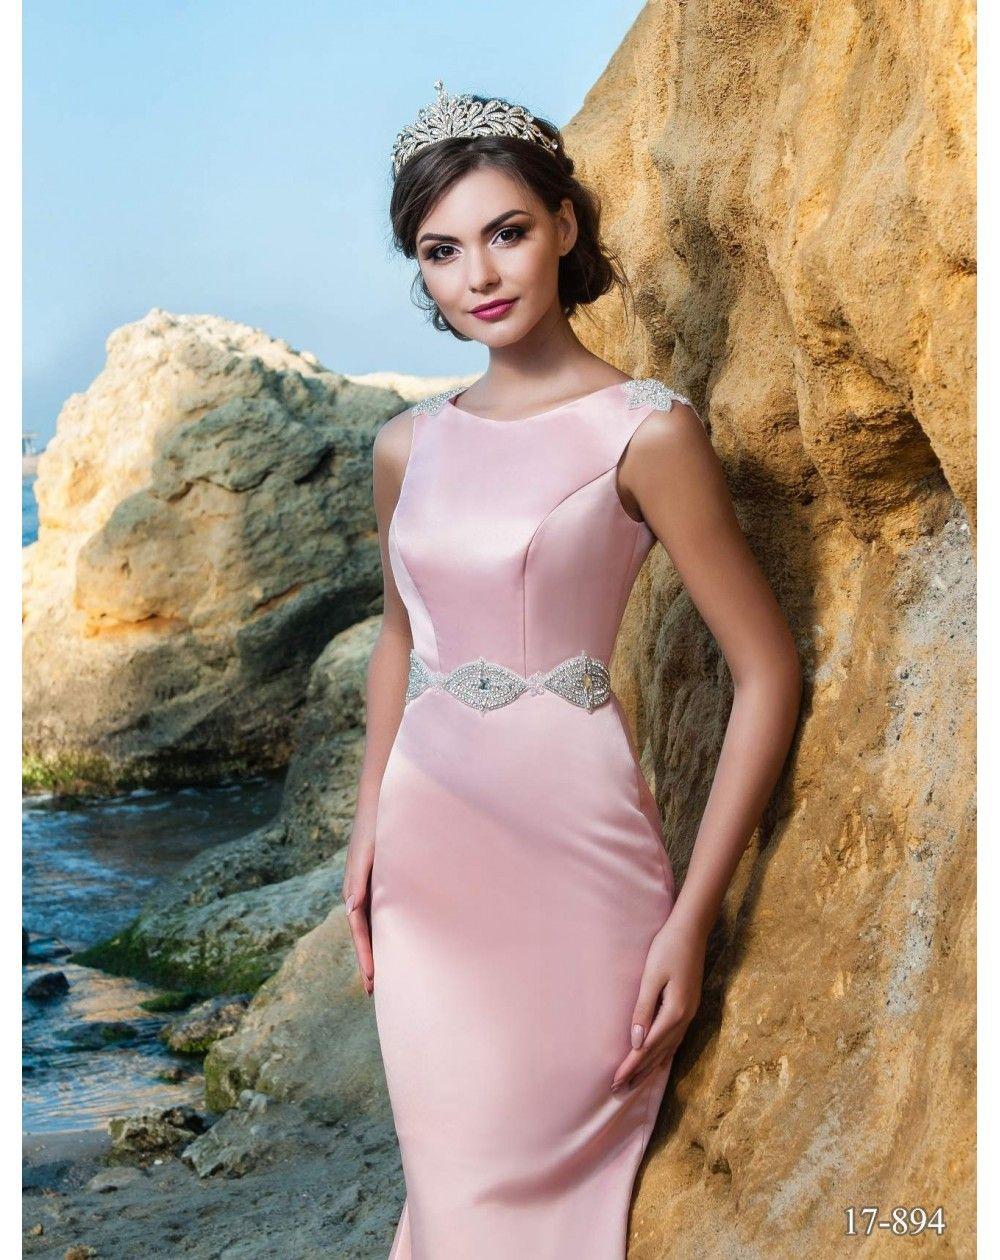 a62749f7d634 Dlhé saténové spoločenské šaty CHELSEY v štýle morská panna zdobené opaskom